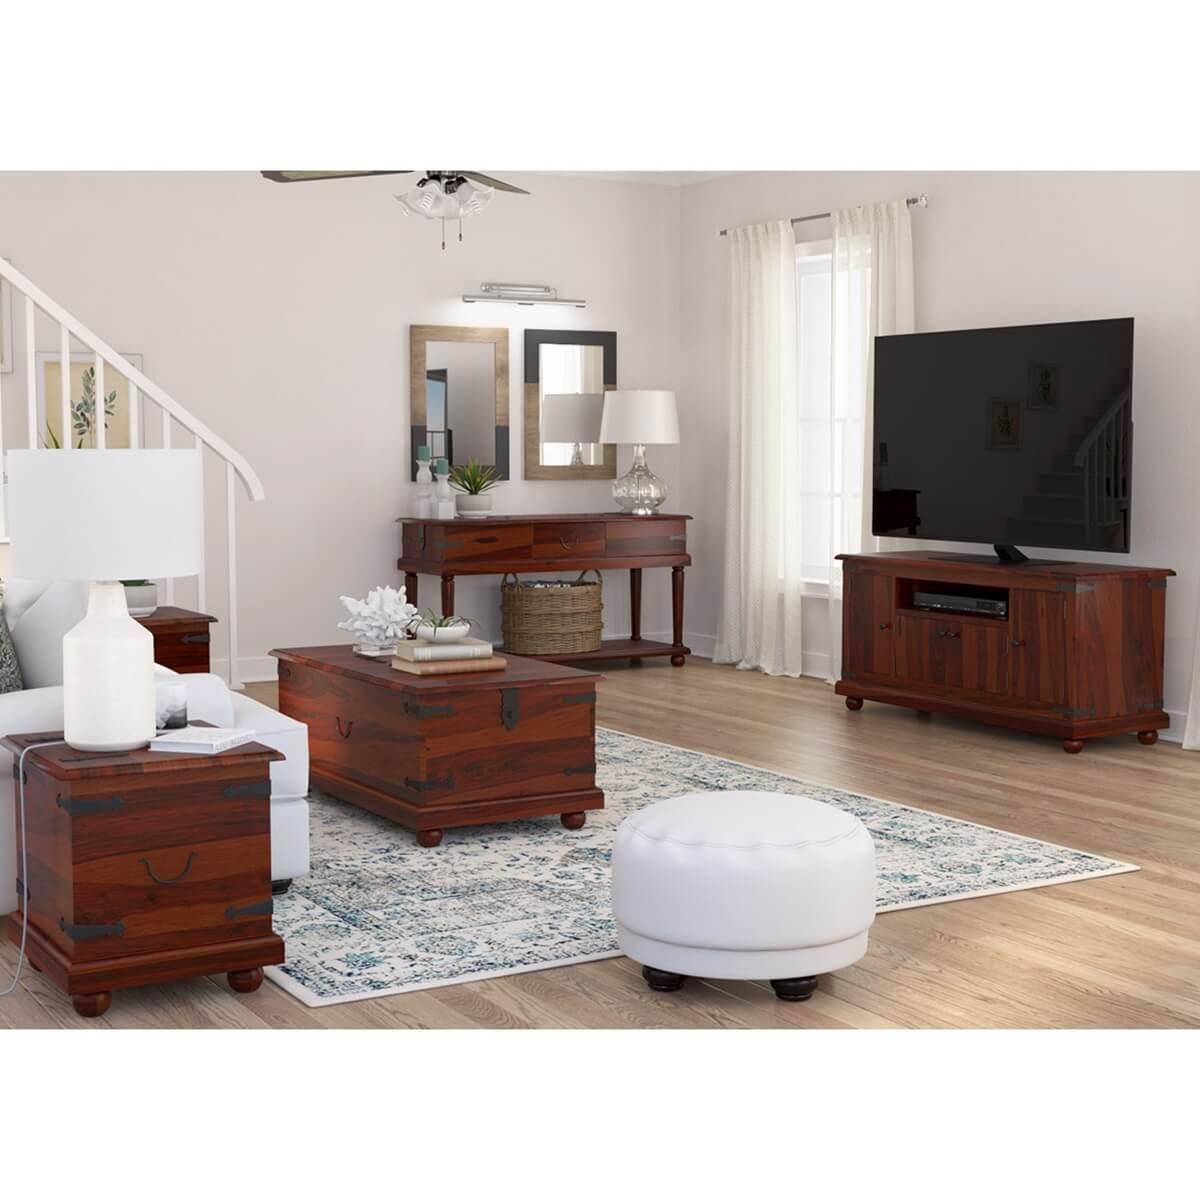 Kokanee Rustic Solid Wood Large 5 Piece Living Room Set